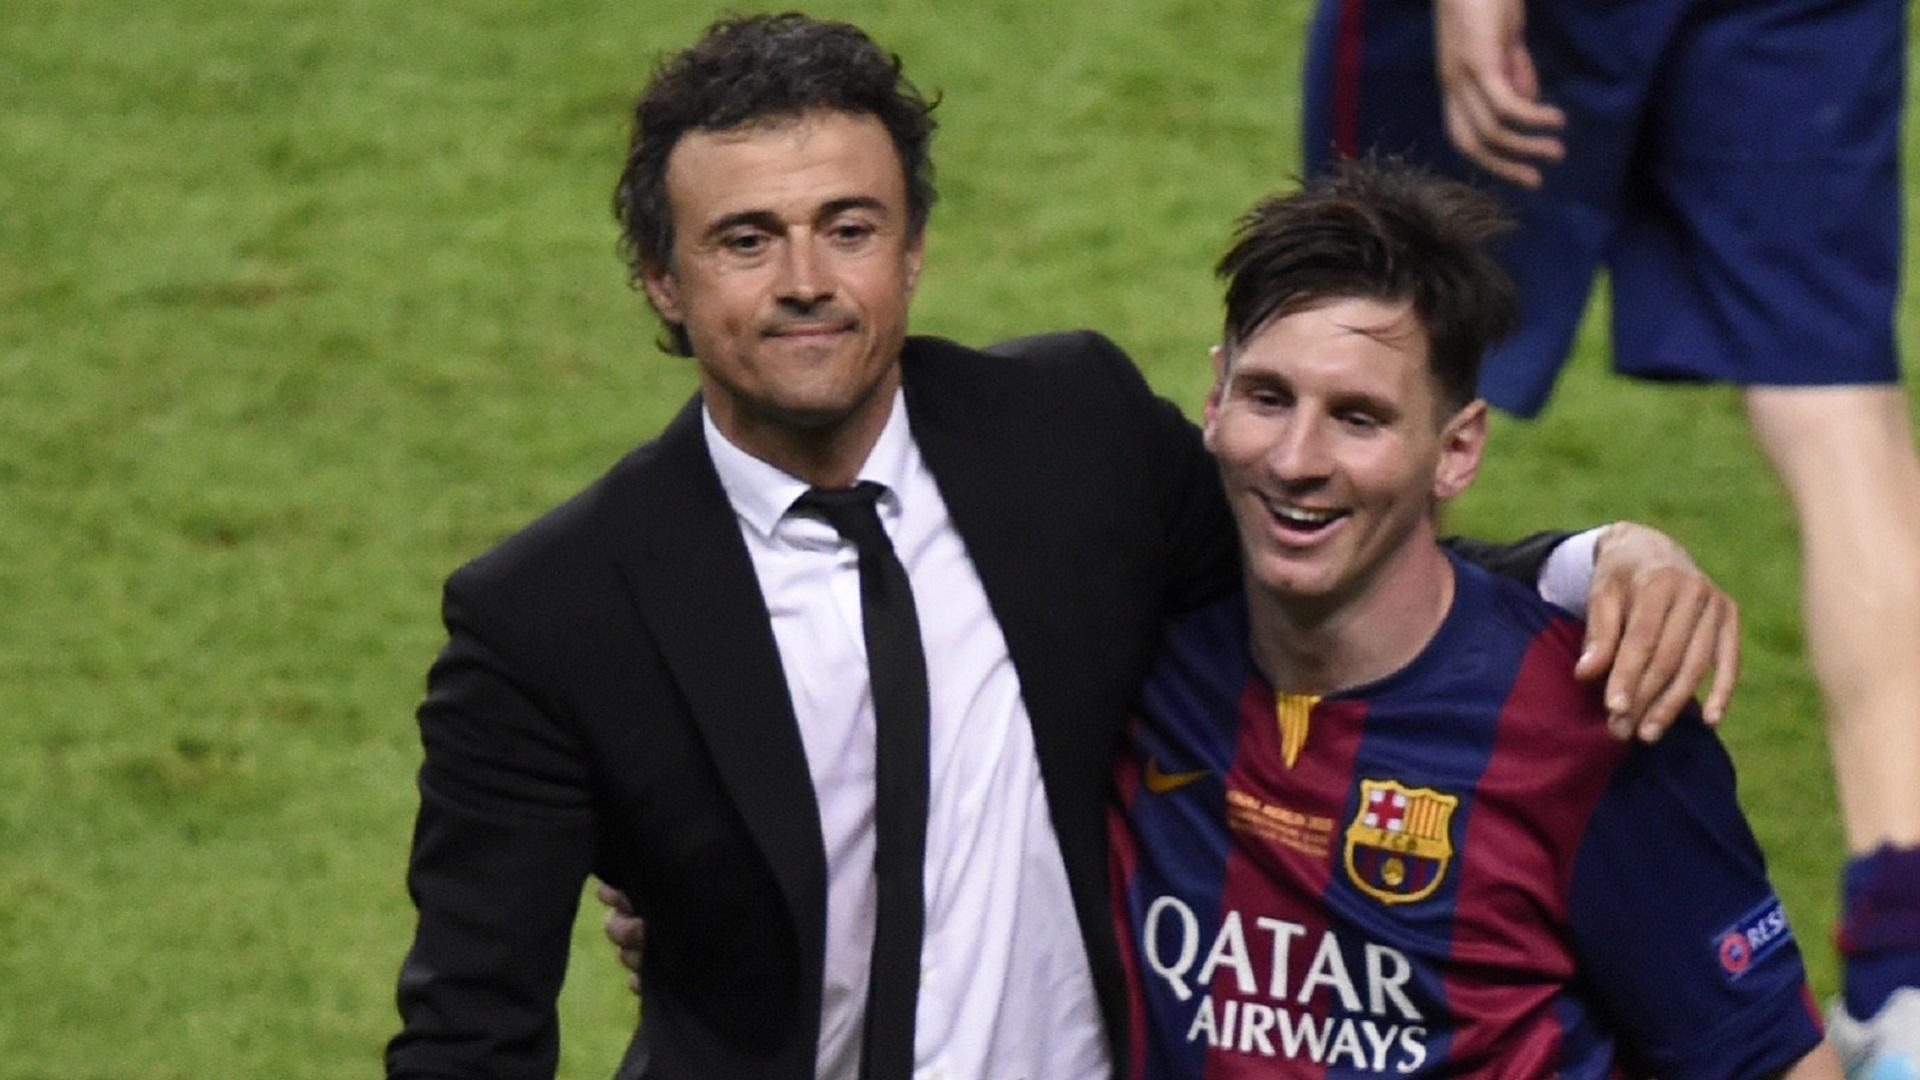 2018-04-21 2015 Luis Enrique Messi